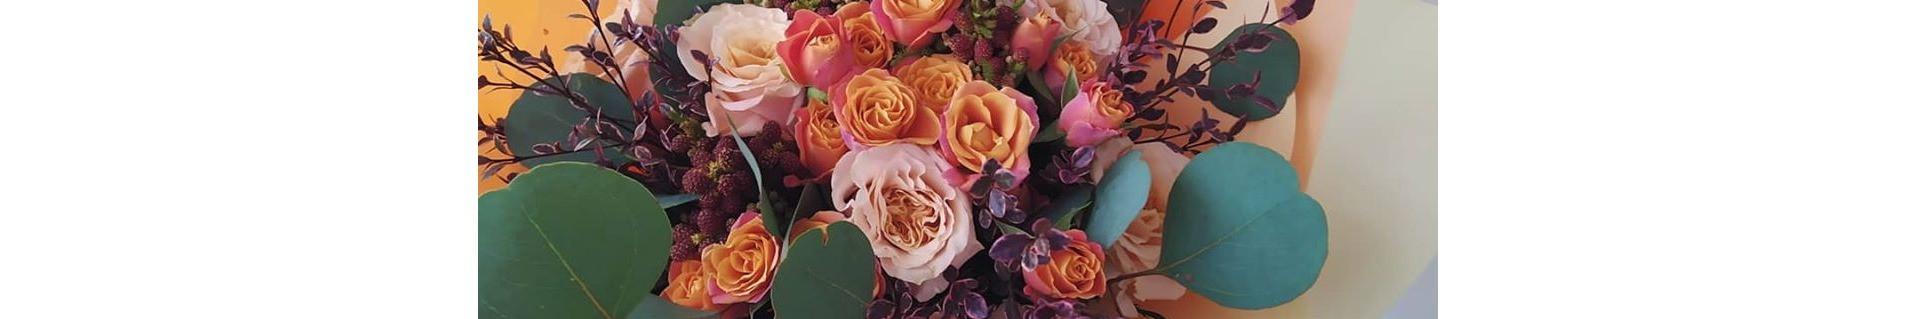 Ваш персональный флорист - Blooming Town